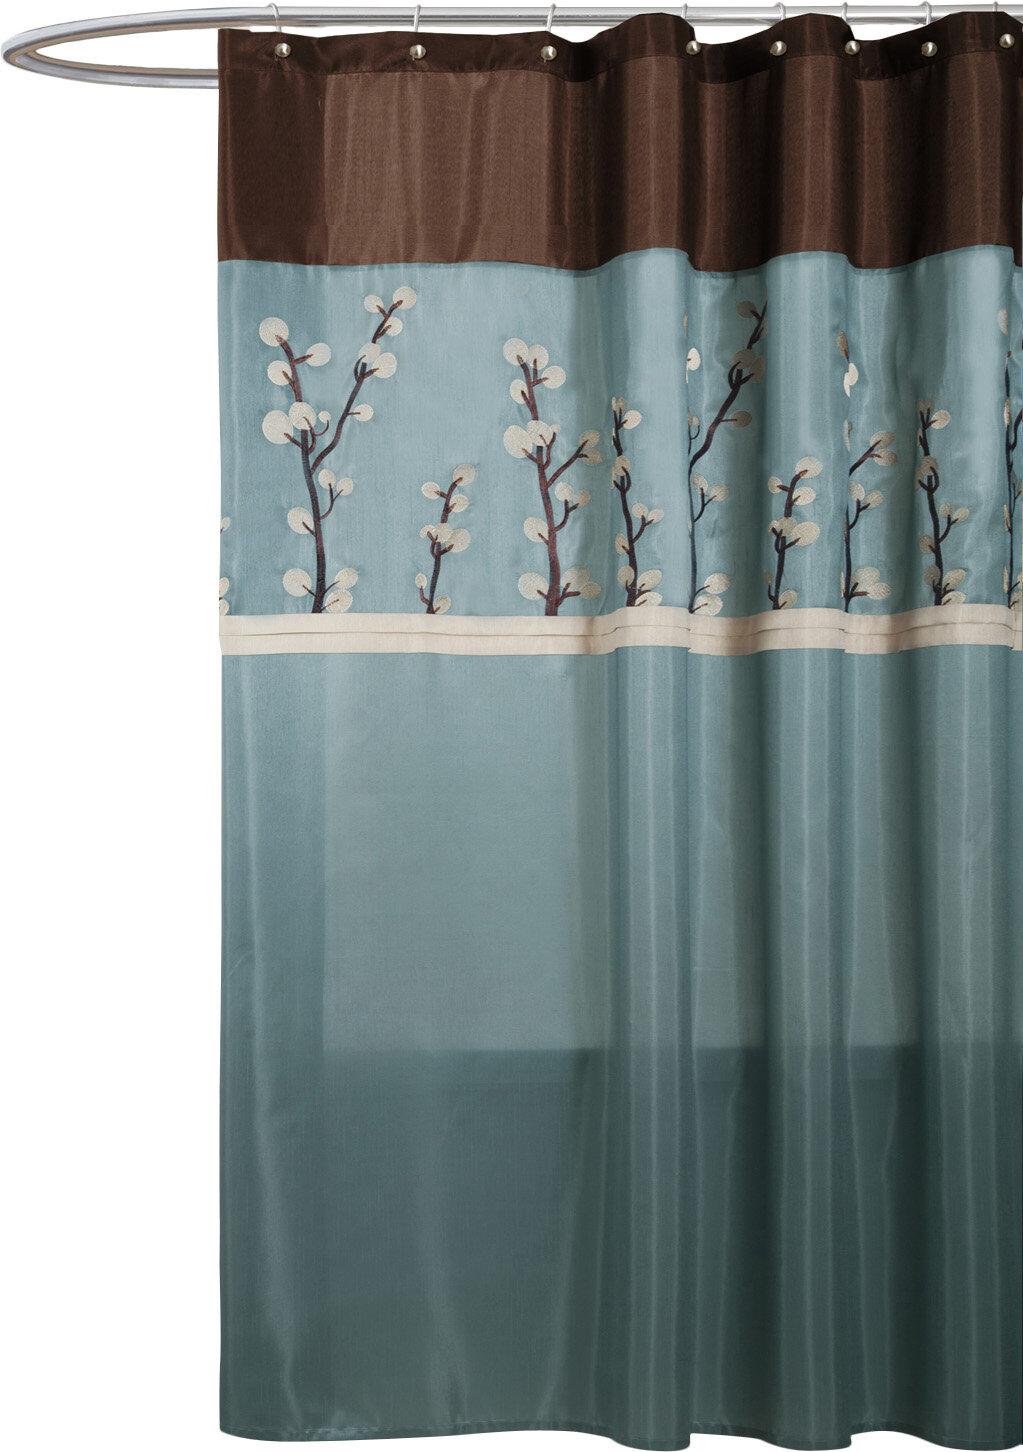 Alcott Hill Kozak Embroidered Shower Curtain